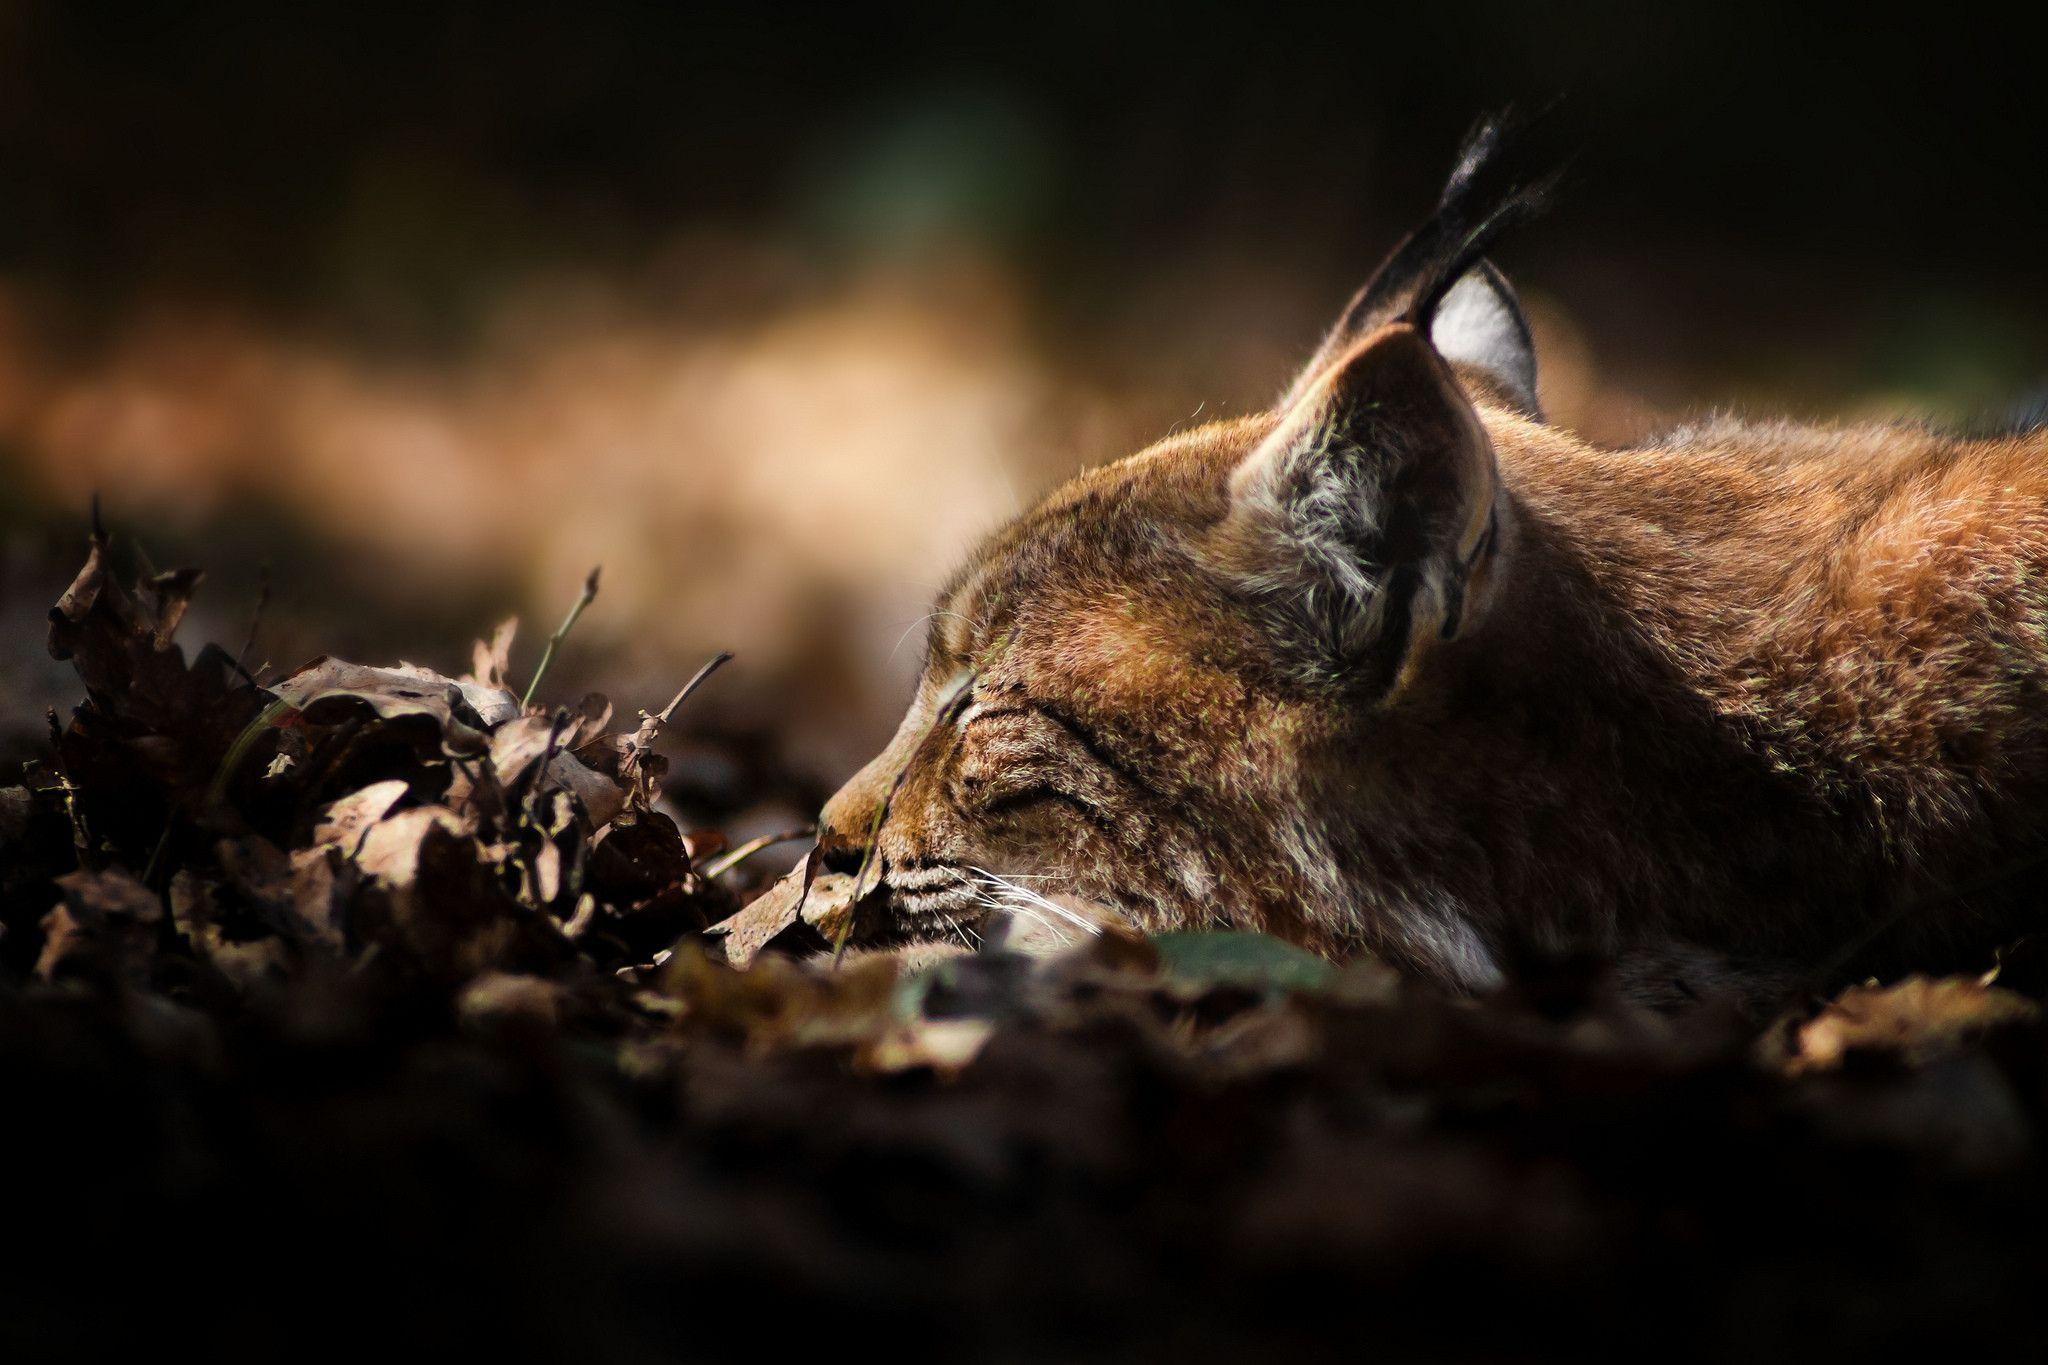 cat lynx autumn foliage - photo #22